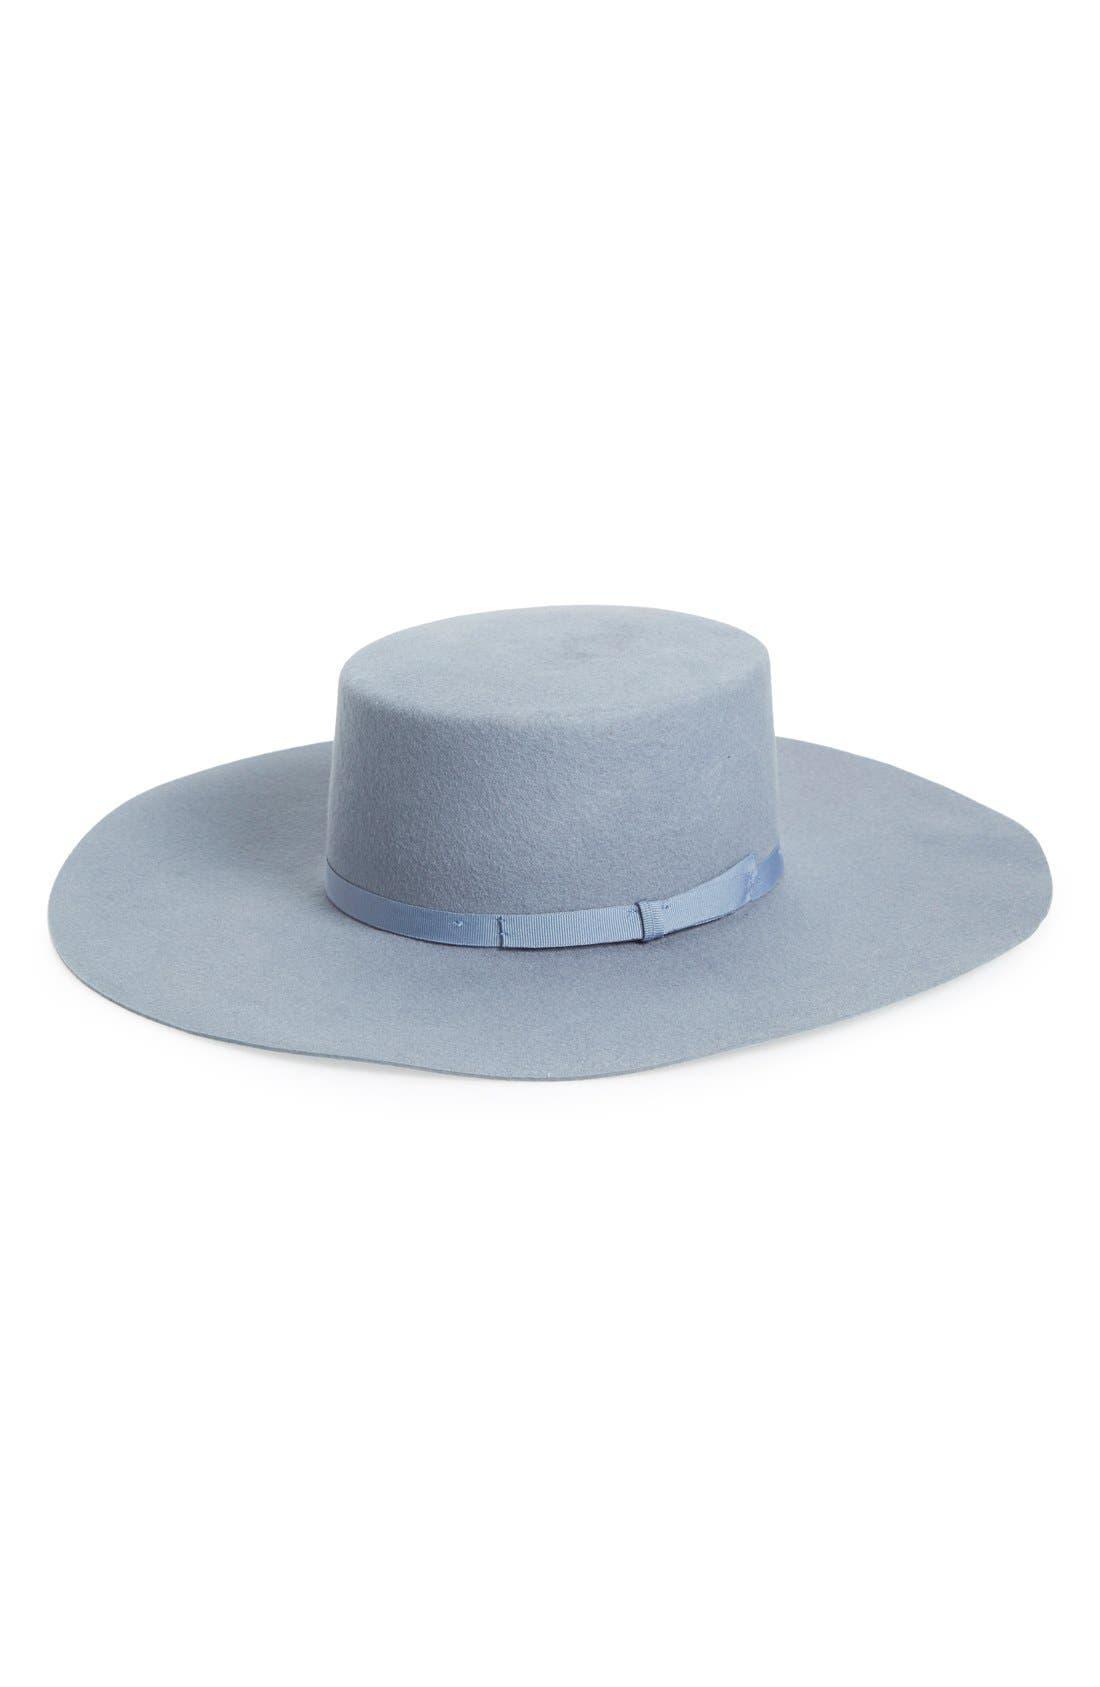 Alternate Image 1 Selected - Brixton 'Ally II' Flat Brim Hat